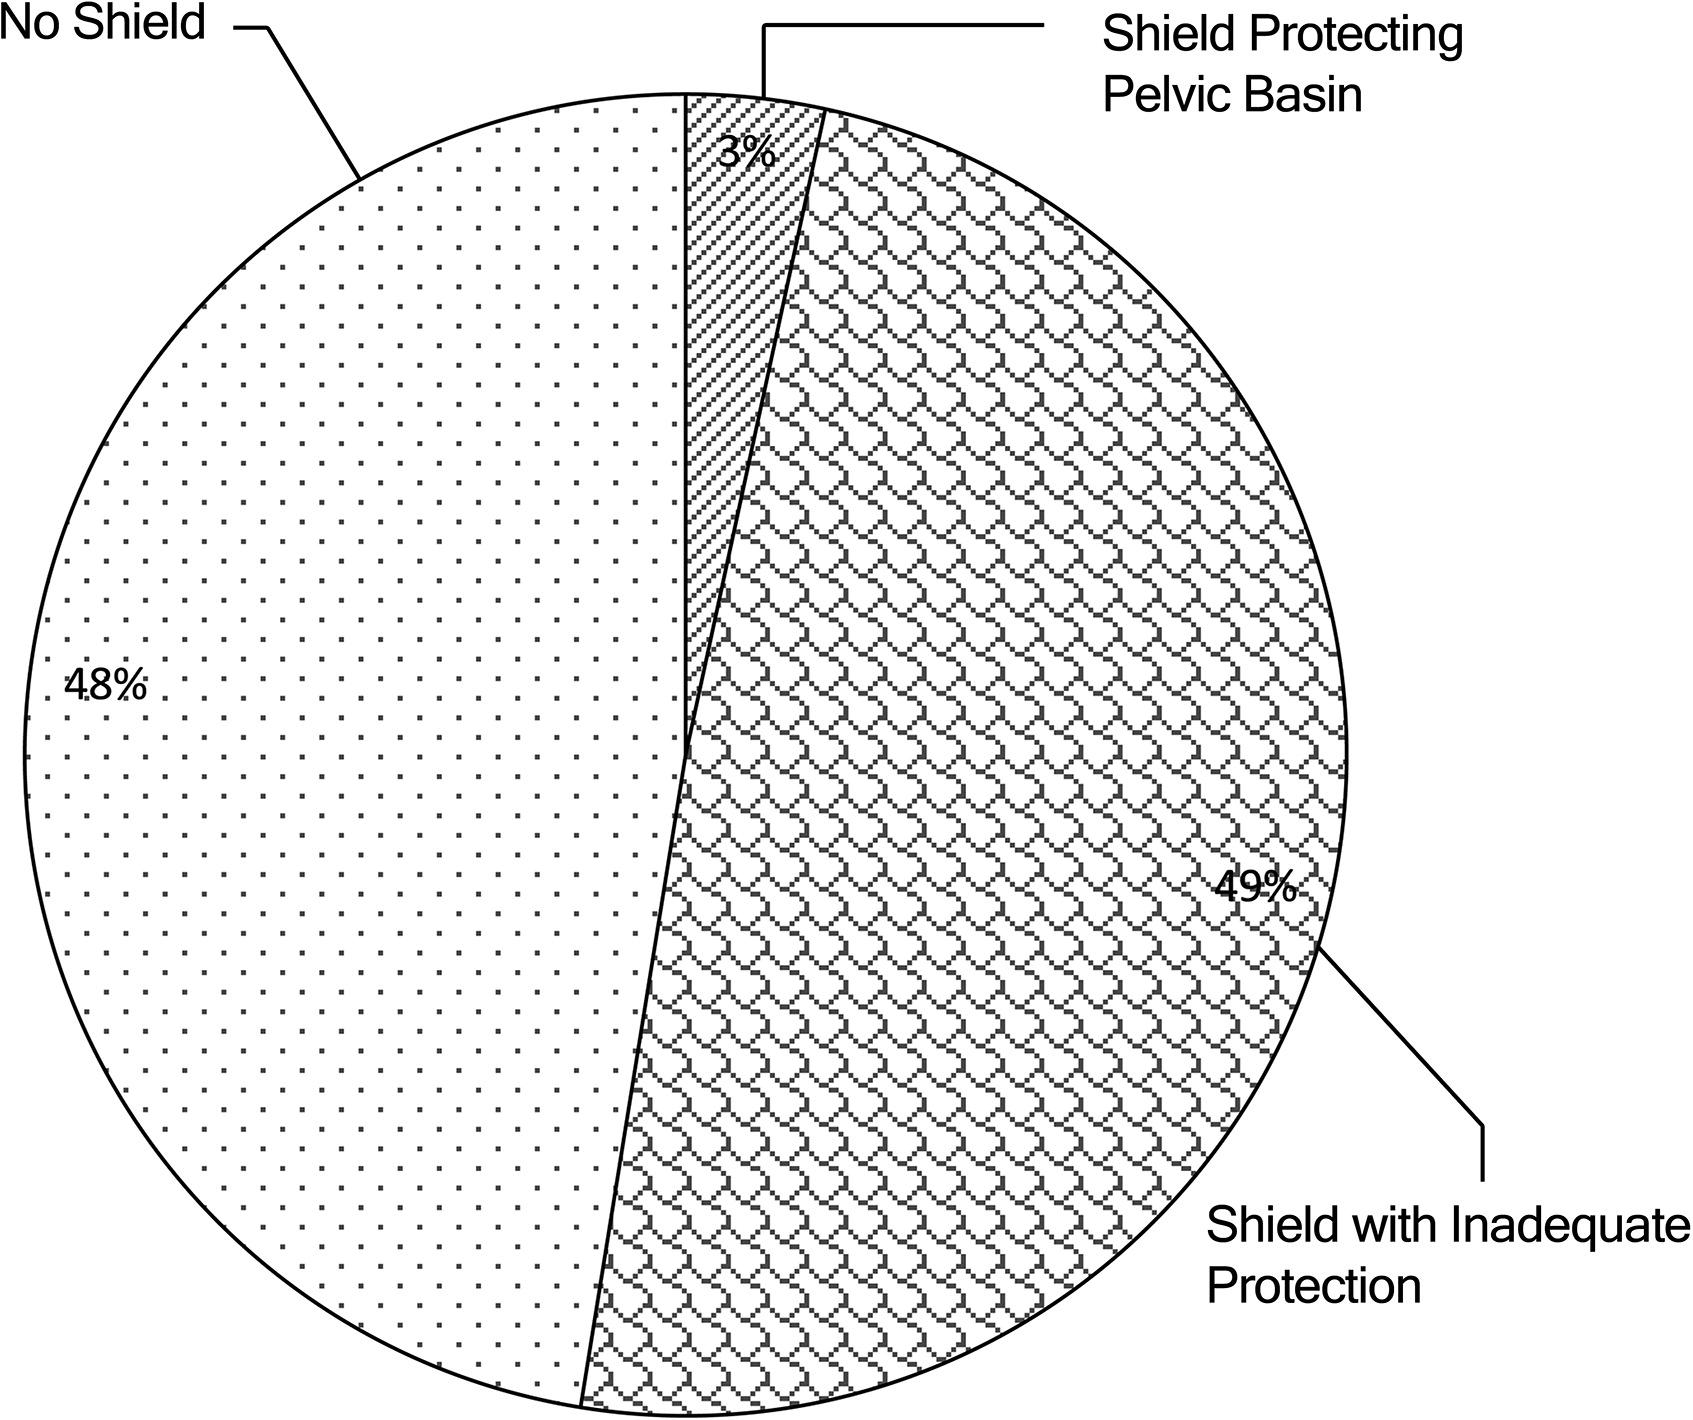 Gonad Shielding In Paediatric Pelvic Radiography